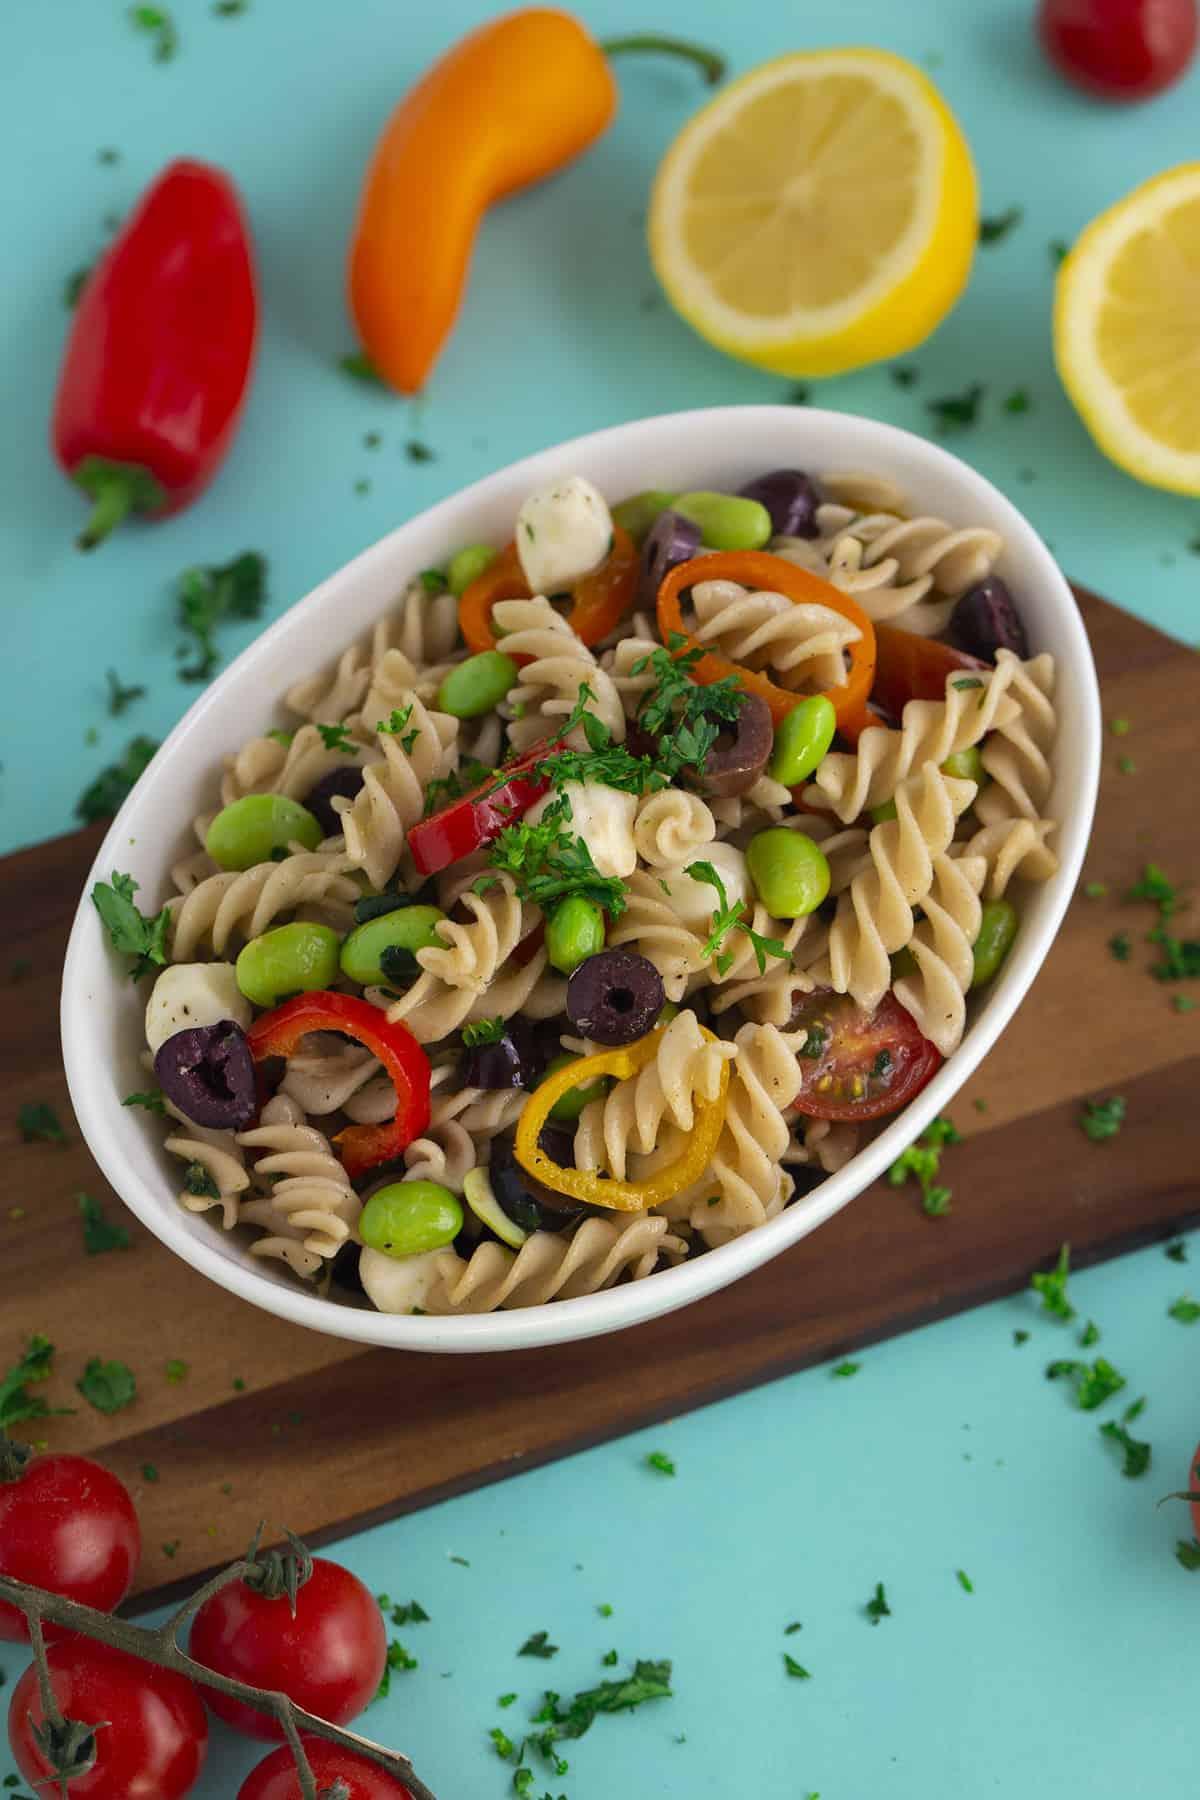 Vegetarian Gluten Free Pasta Salad